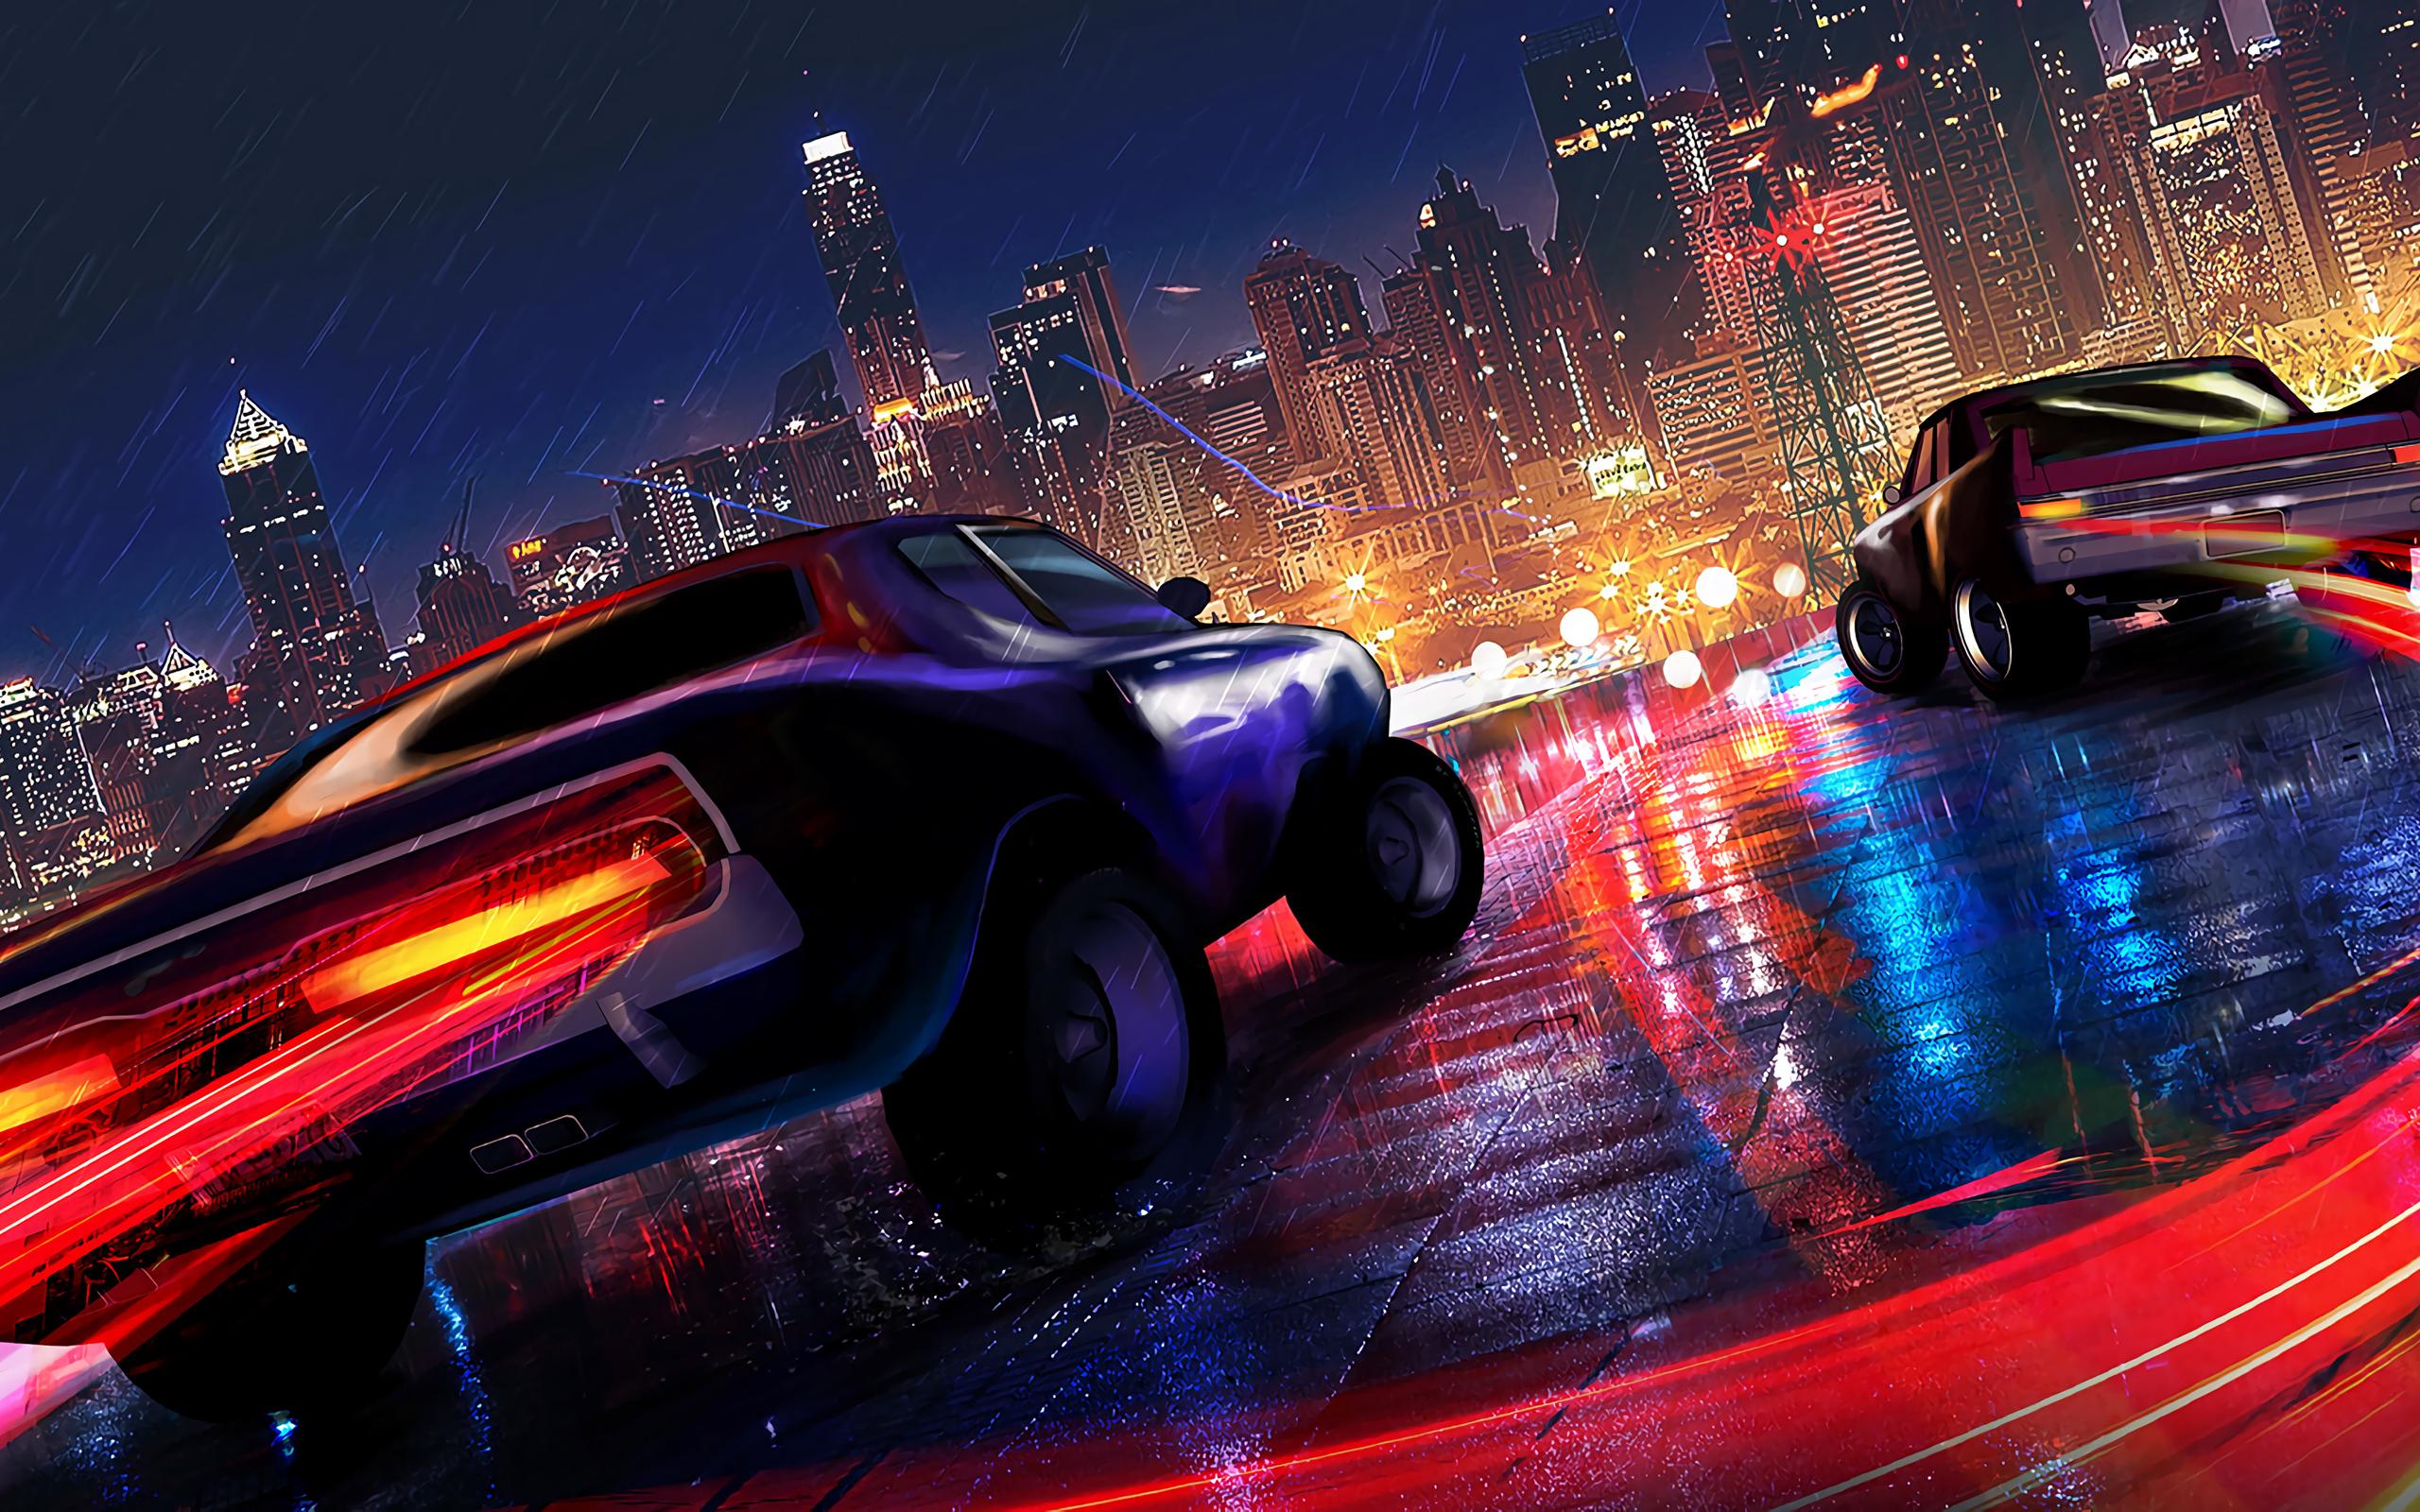 2560x1600 Car Drifting Neon Lights 4k 2560x1600 Resolution ...